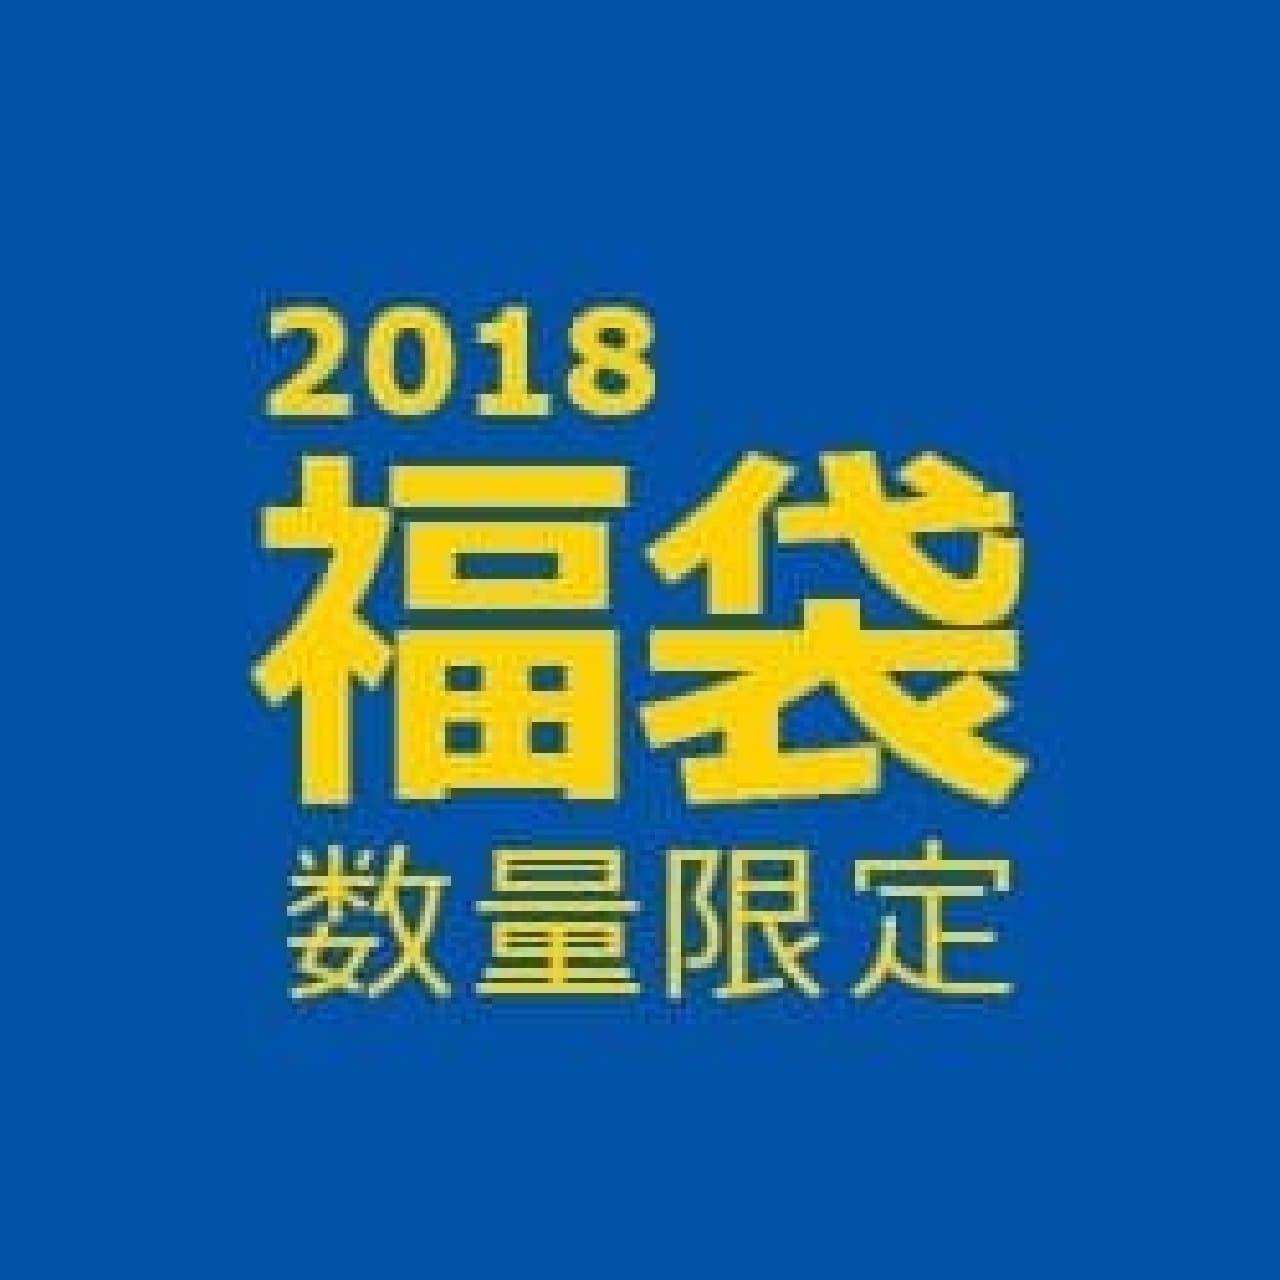 IKEA鶴浜「2018 福袋」